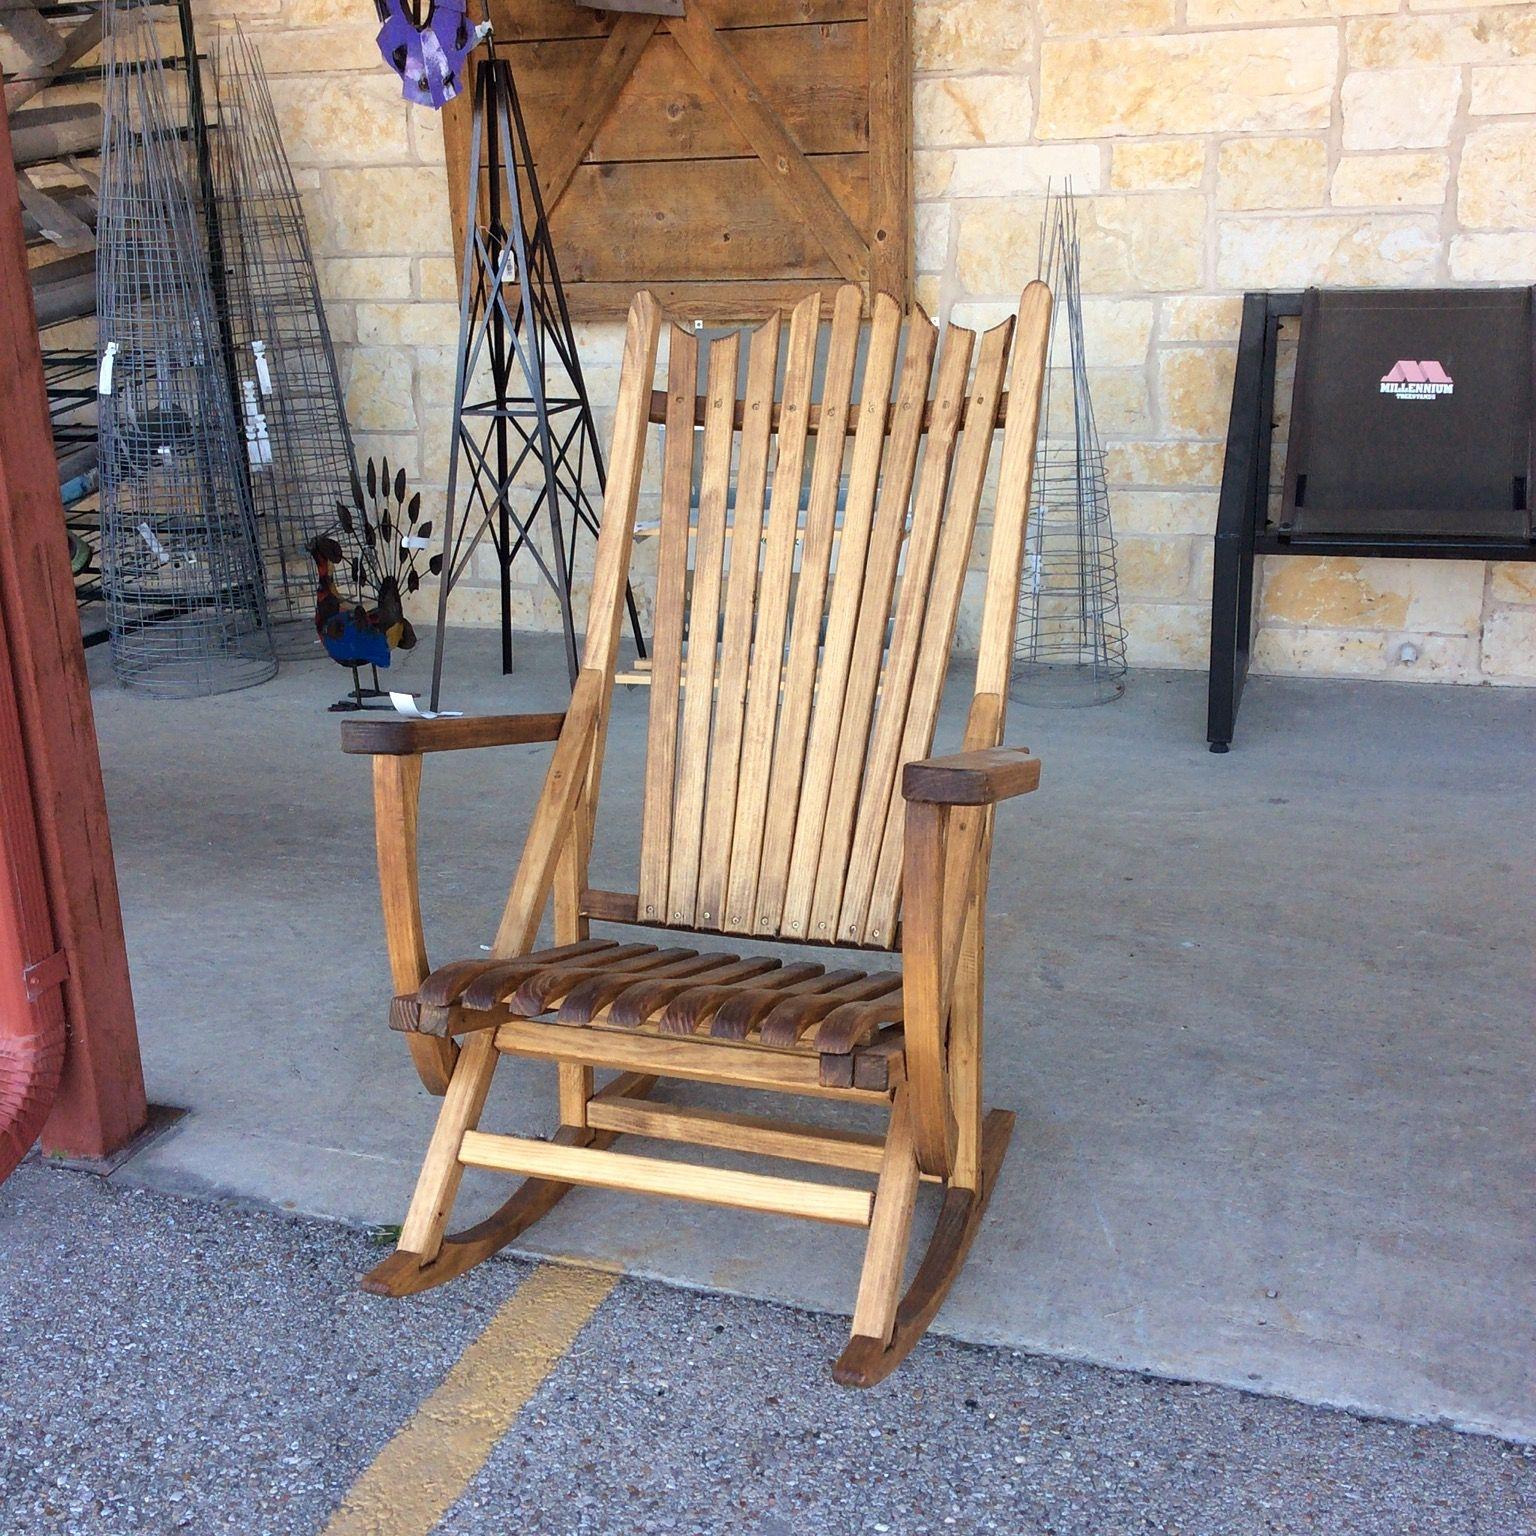 Plum Creek Rocker As Seen On Hgtv S Fixer Upper Mcgregor General Store Clearance Patio Furniture Porch Rocker Rocking Chair Porch